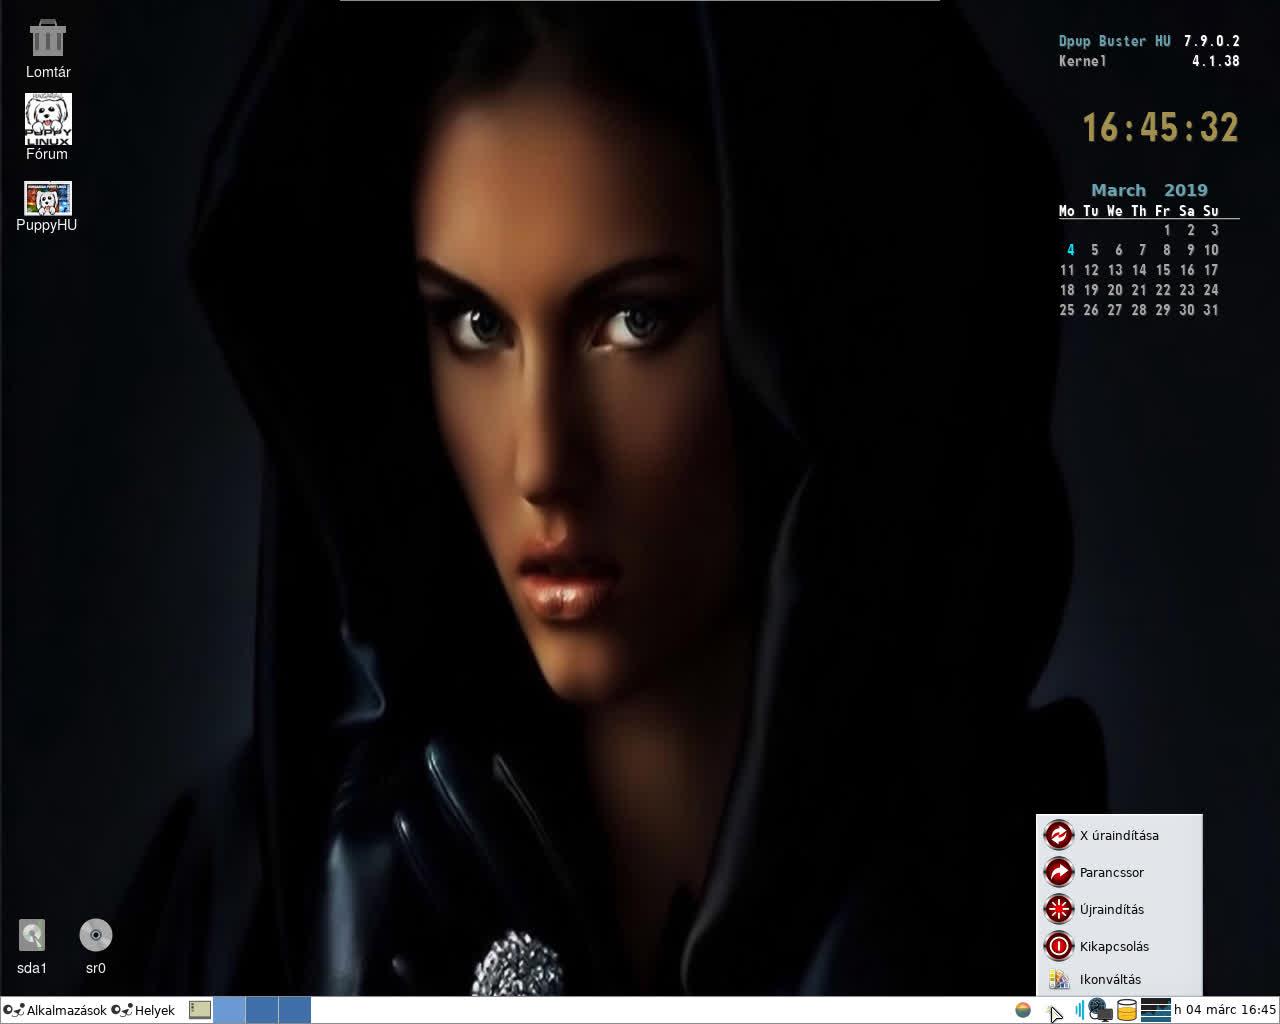 Dpup Buster 7.9.0.2 HU K4.19.20 PAE T2 – videó